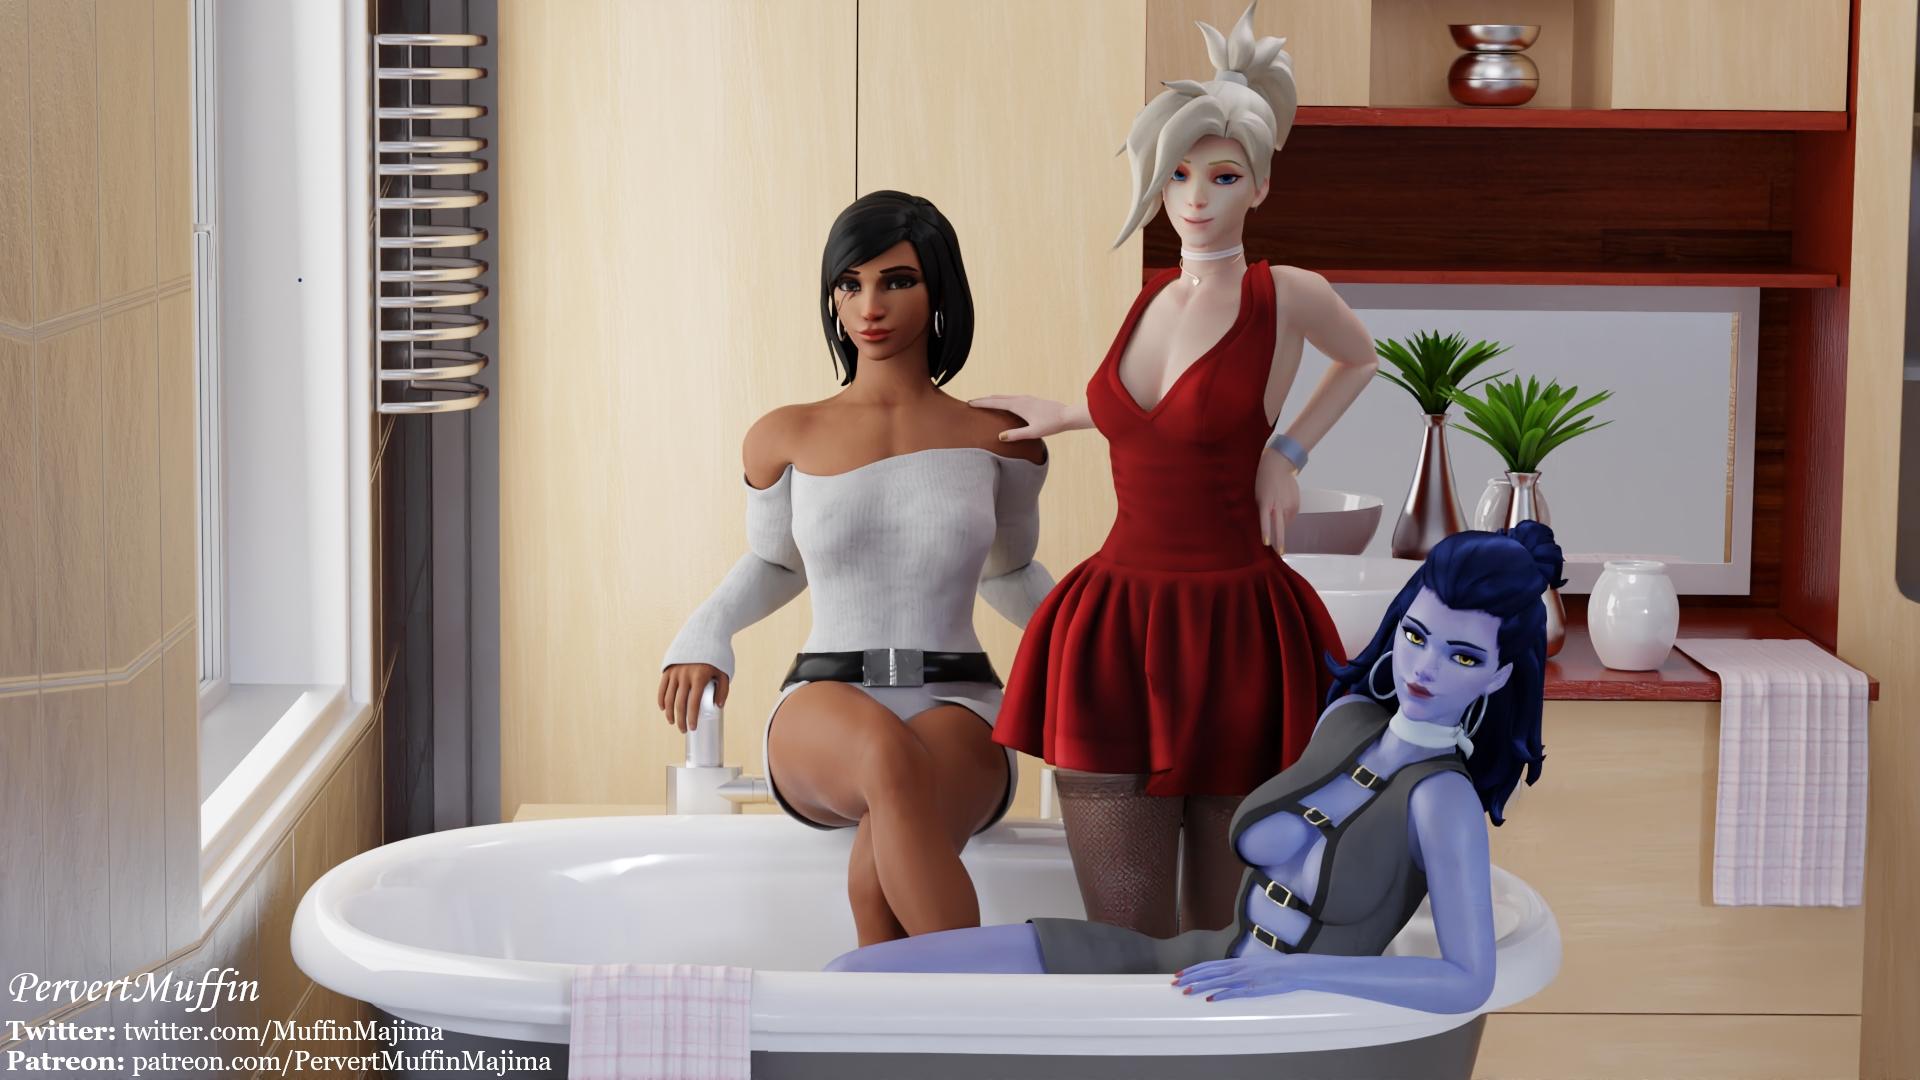 OW Girls On The Bathtub (Dress) - page01 Overwatch,  xxx porn rule34